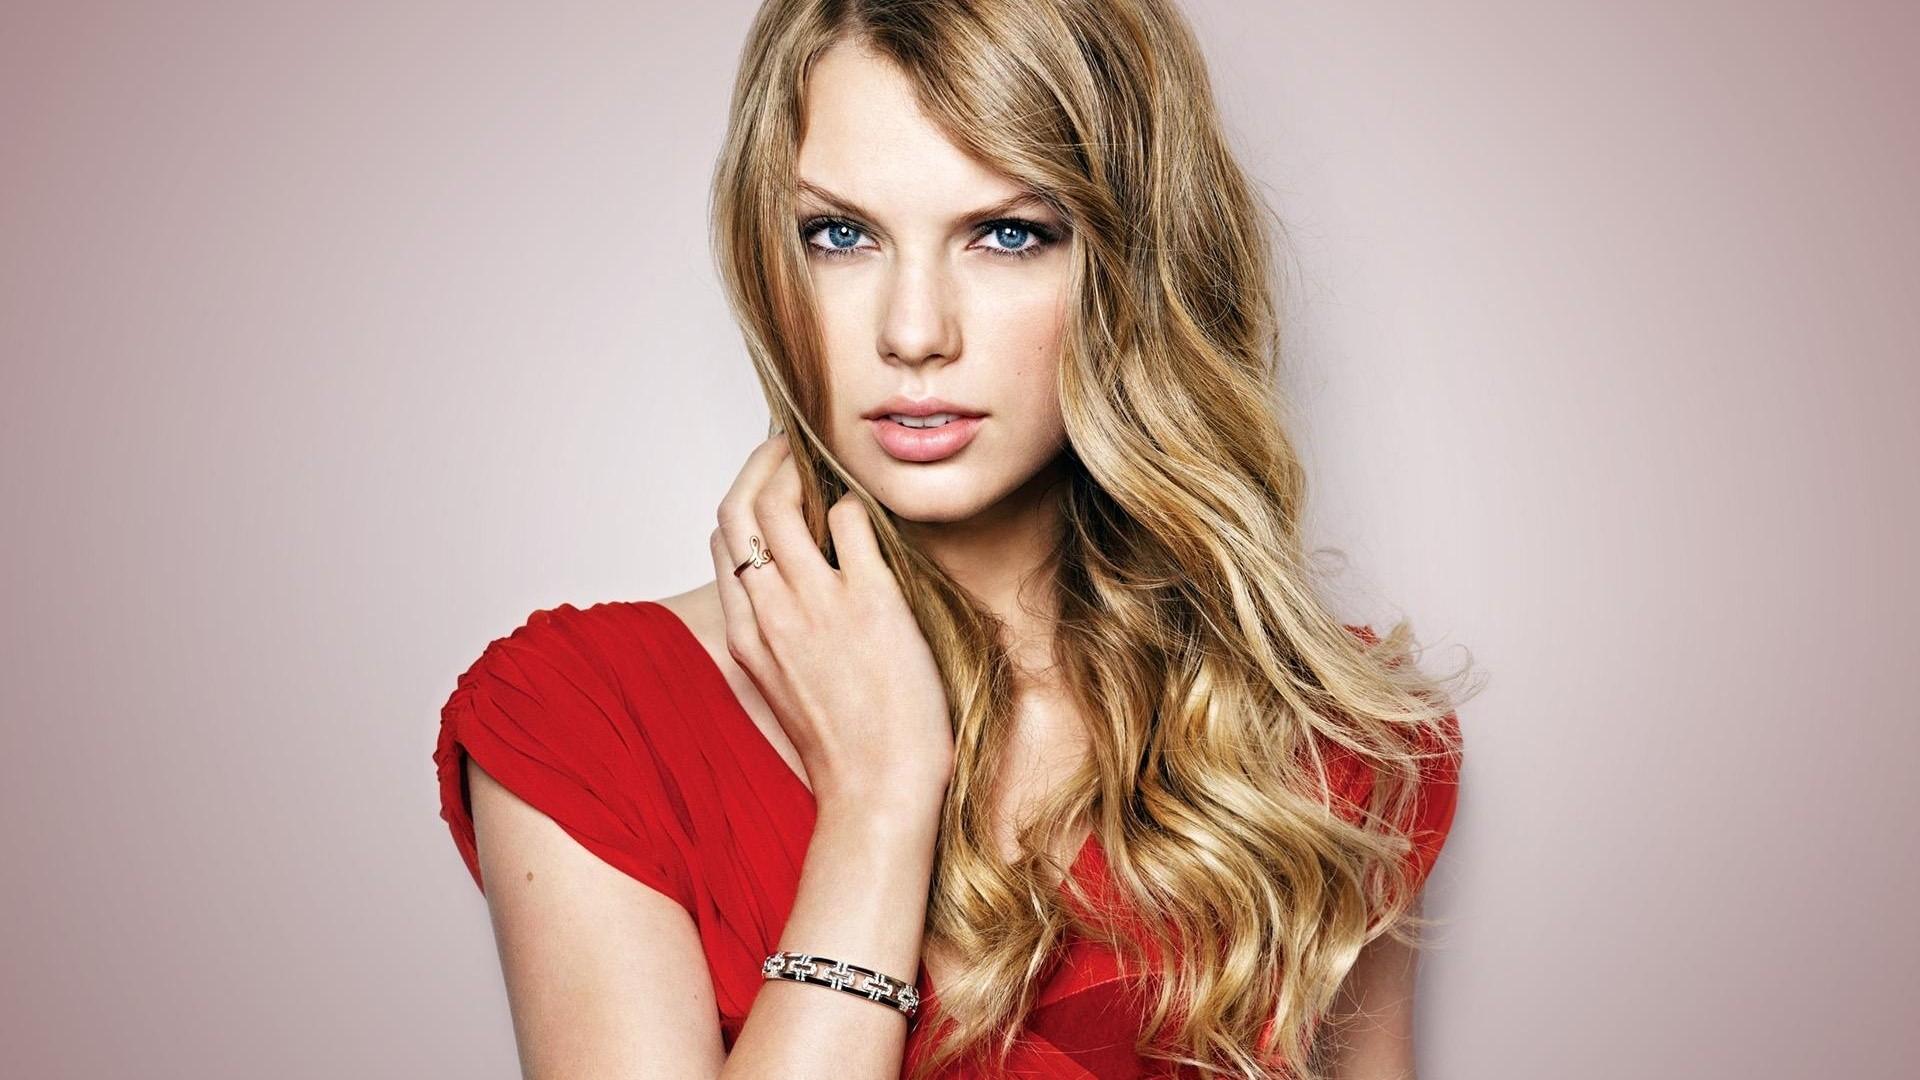 Taylor Swift Free Wallpaper